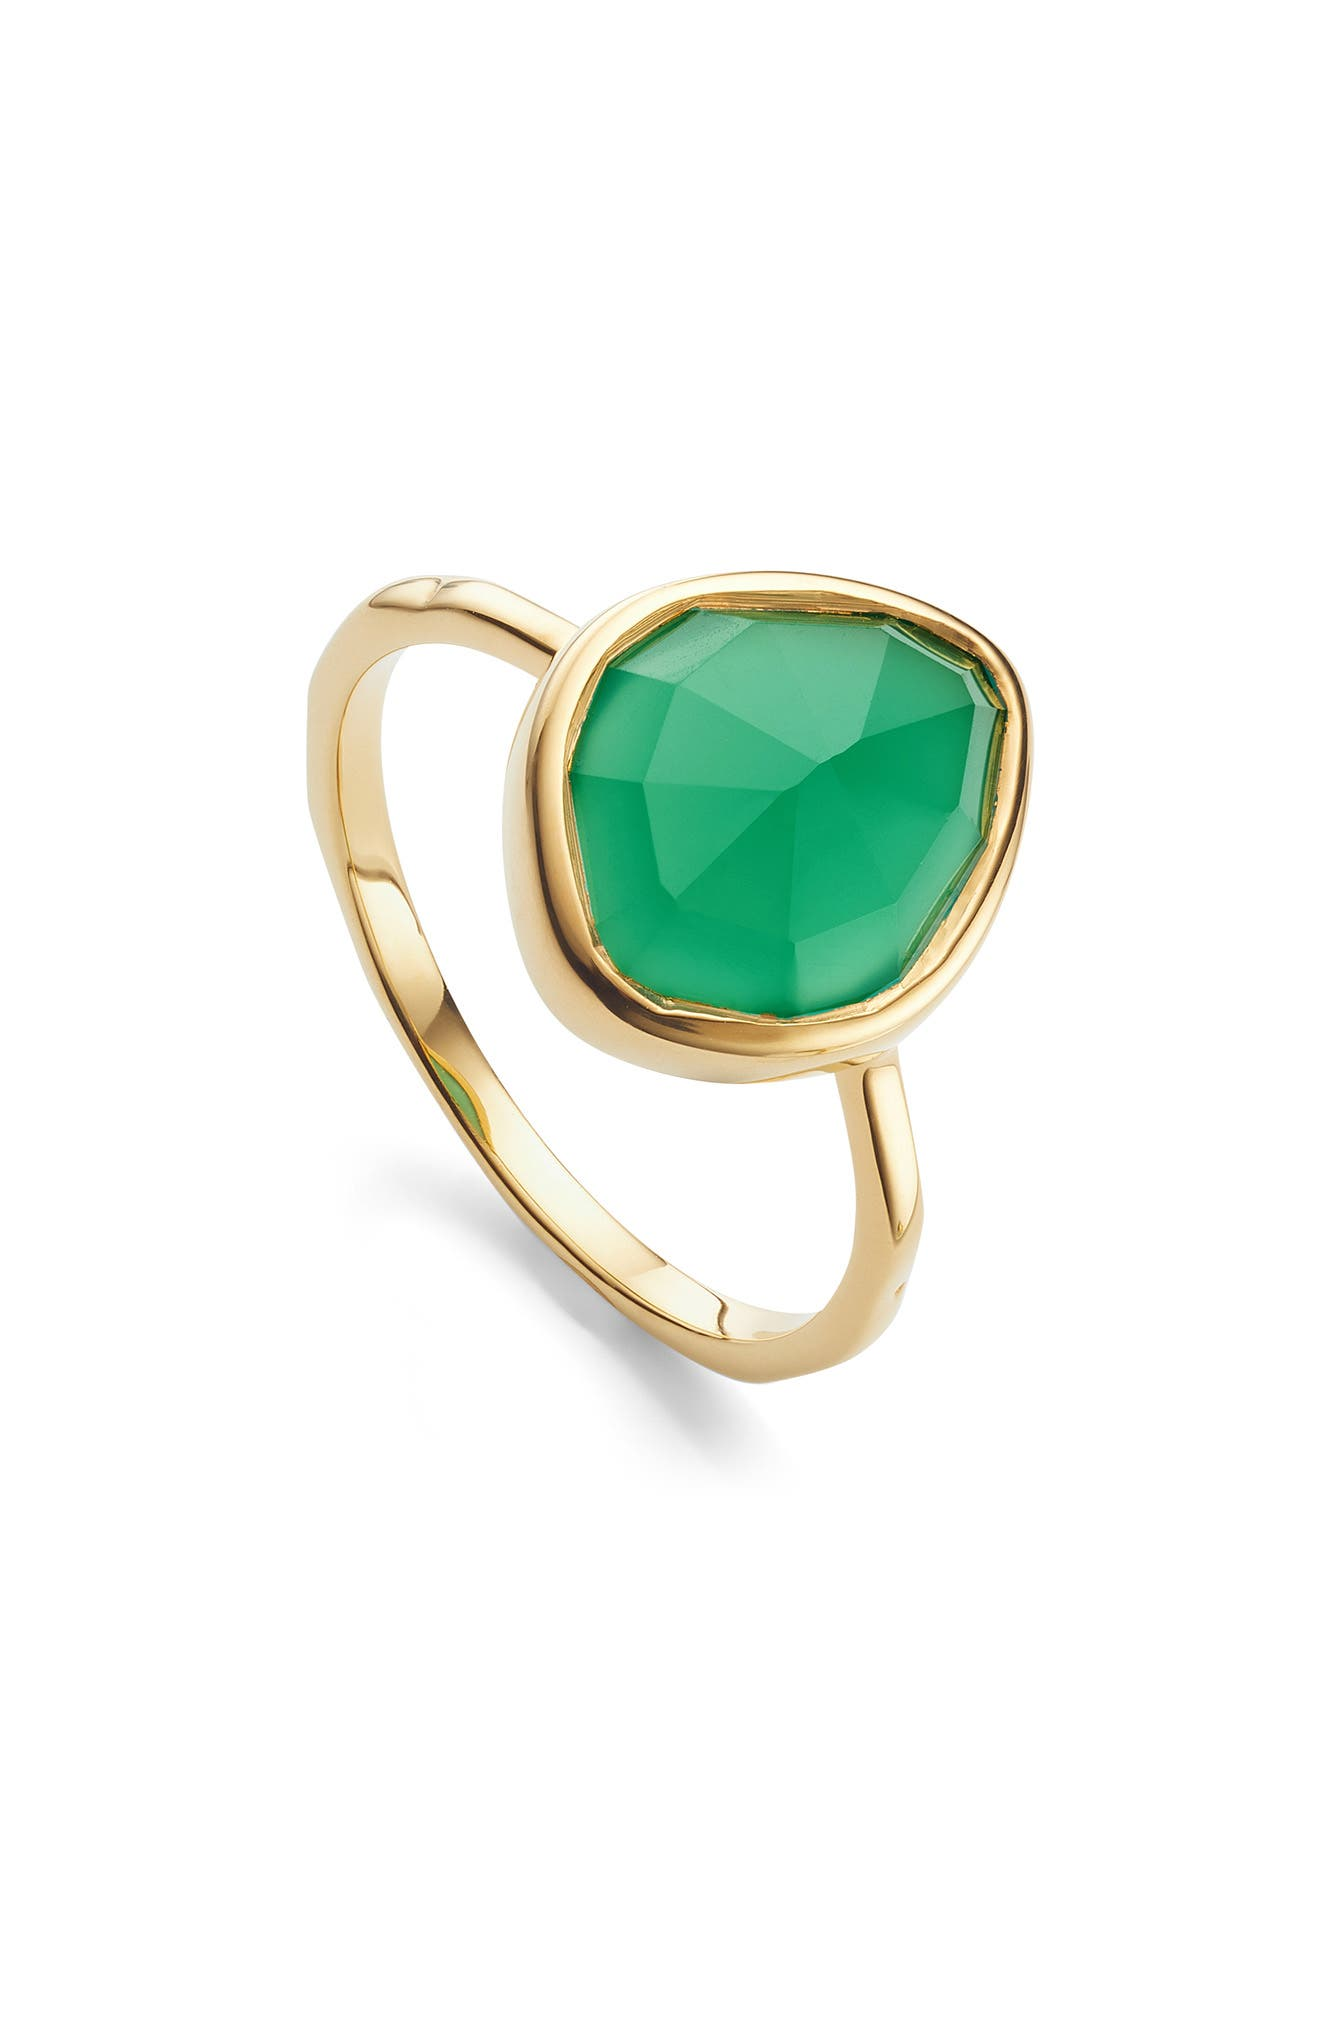 MONICA VINADER, Siren Small Nugget Stacking Ring, Main thumbnail 1, color, GOLD/ GREEN ONYX